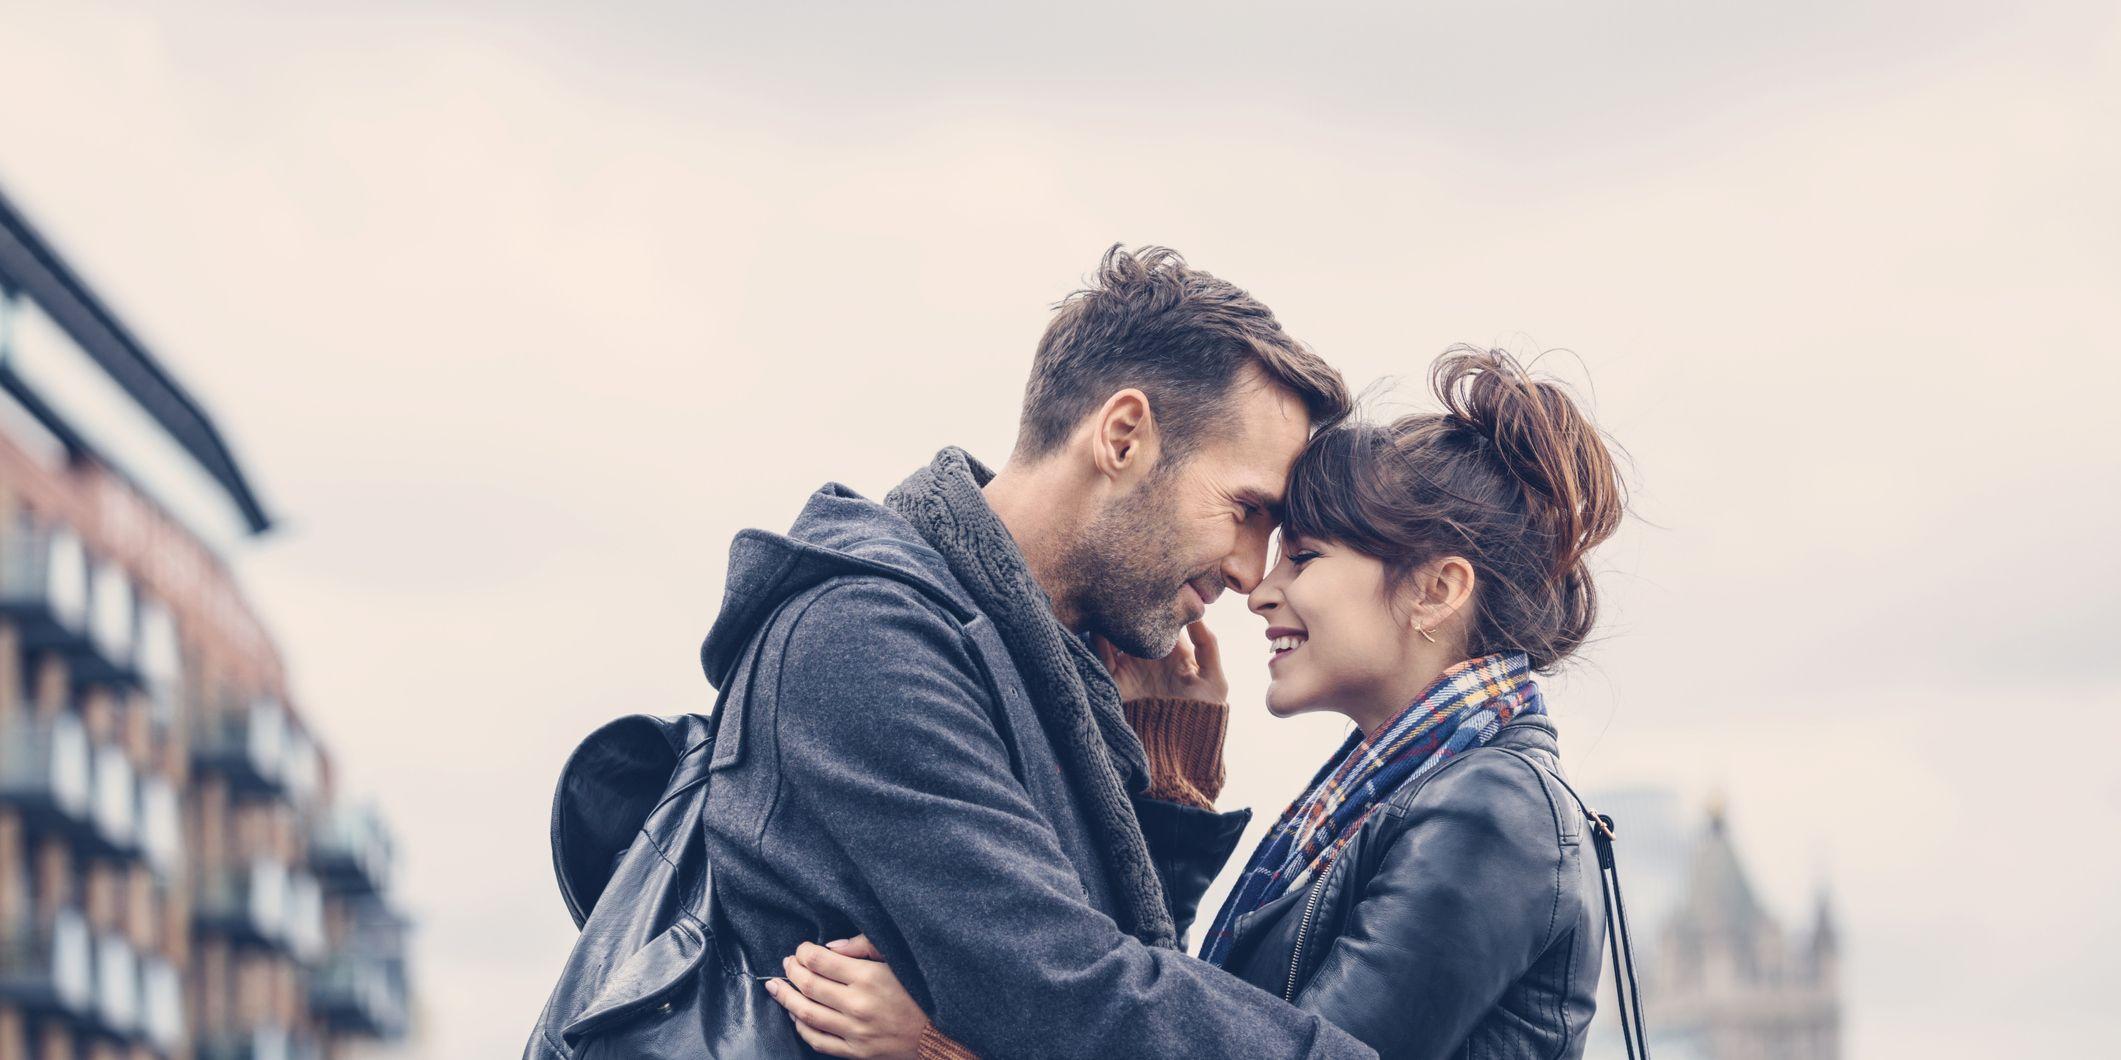 Outdoor shot of happy couple flirting on bridge in London